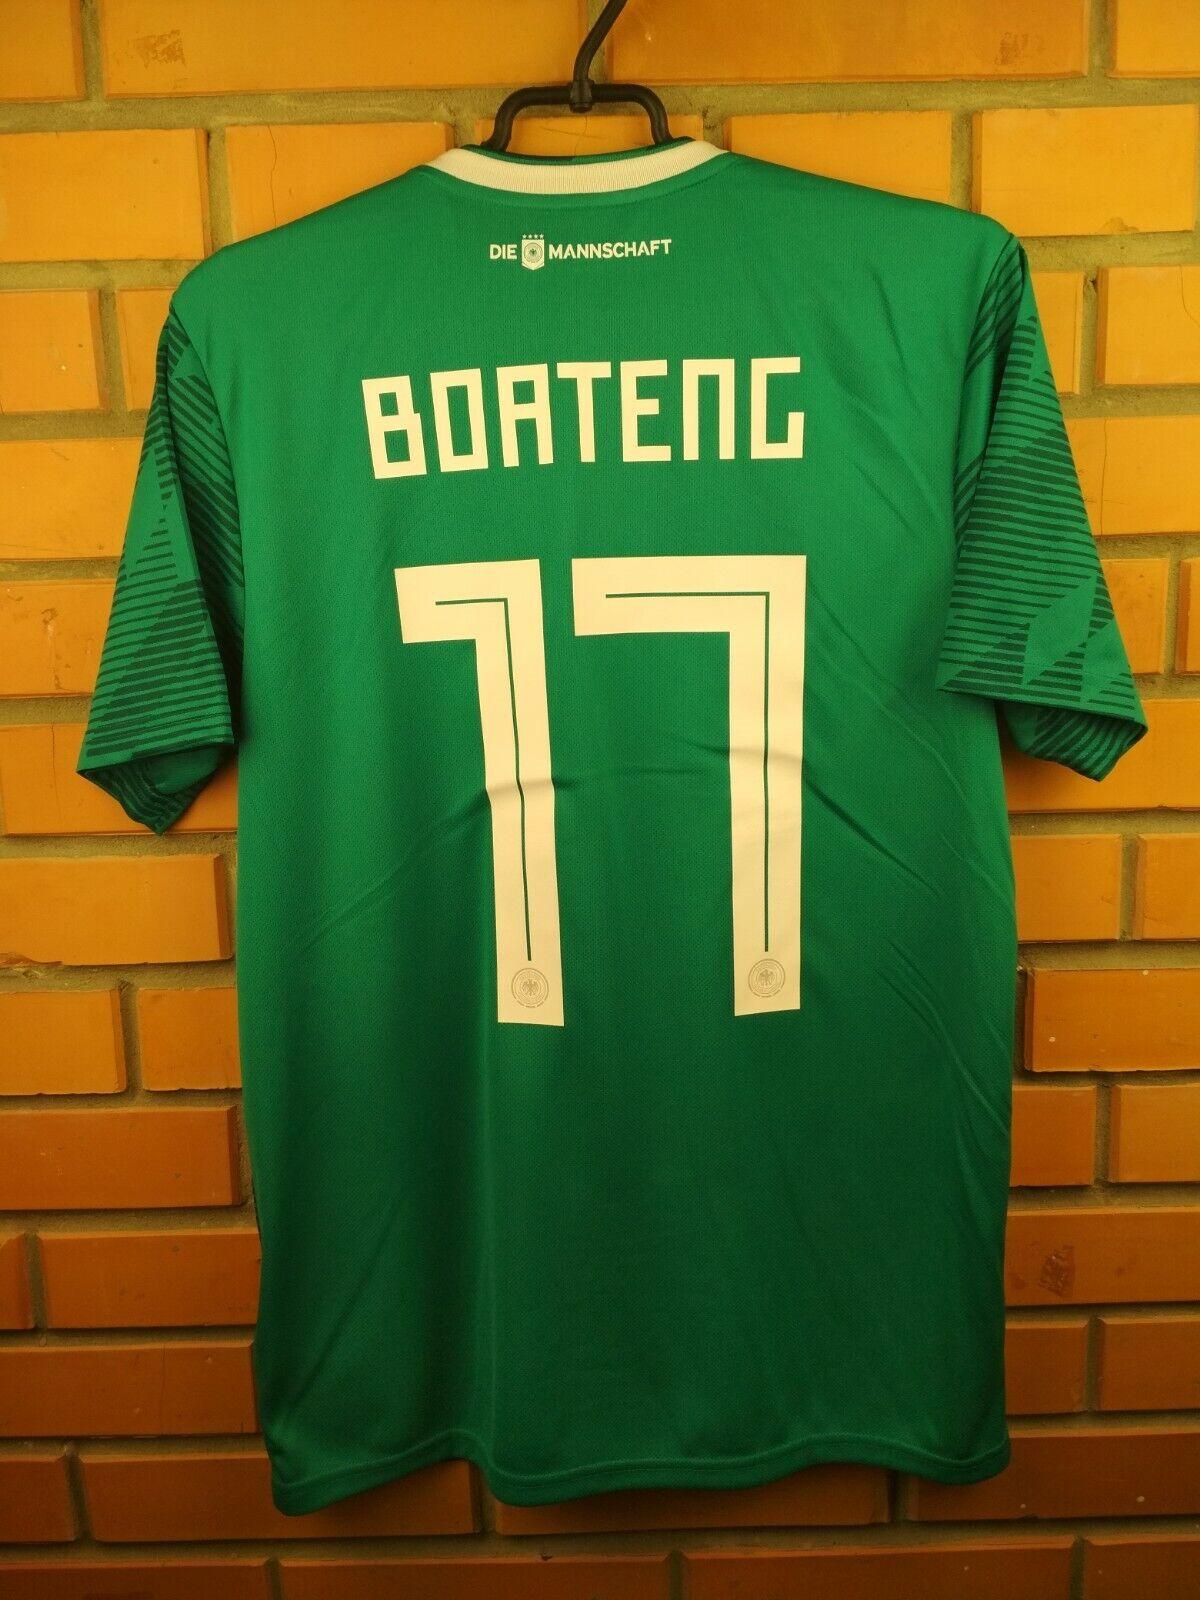 Camiseta Talle Medio 2019 Boateng Alemania Lejos Camiseta Fútbol Fútbol Adidas BR3144